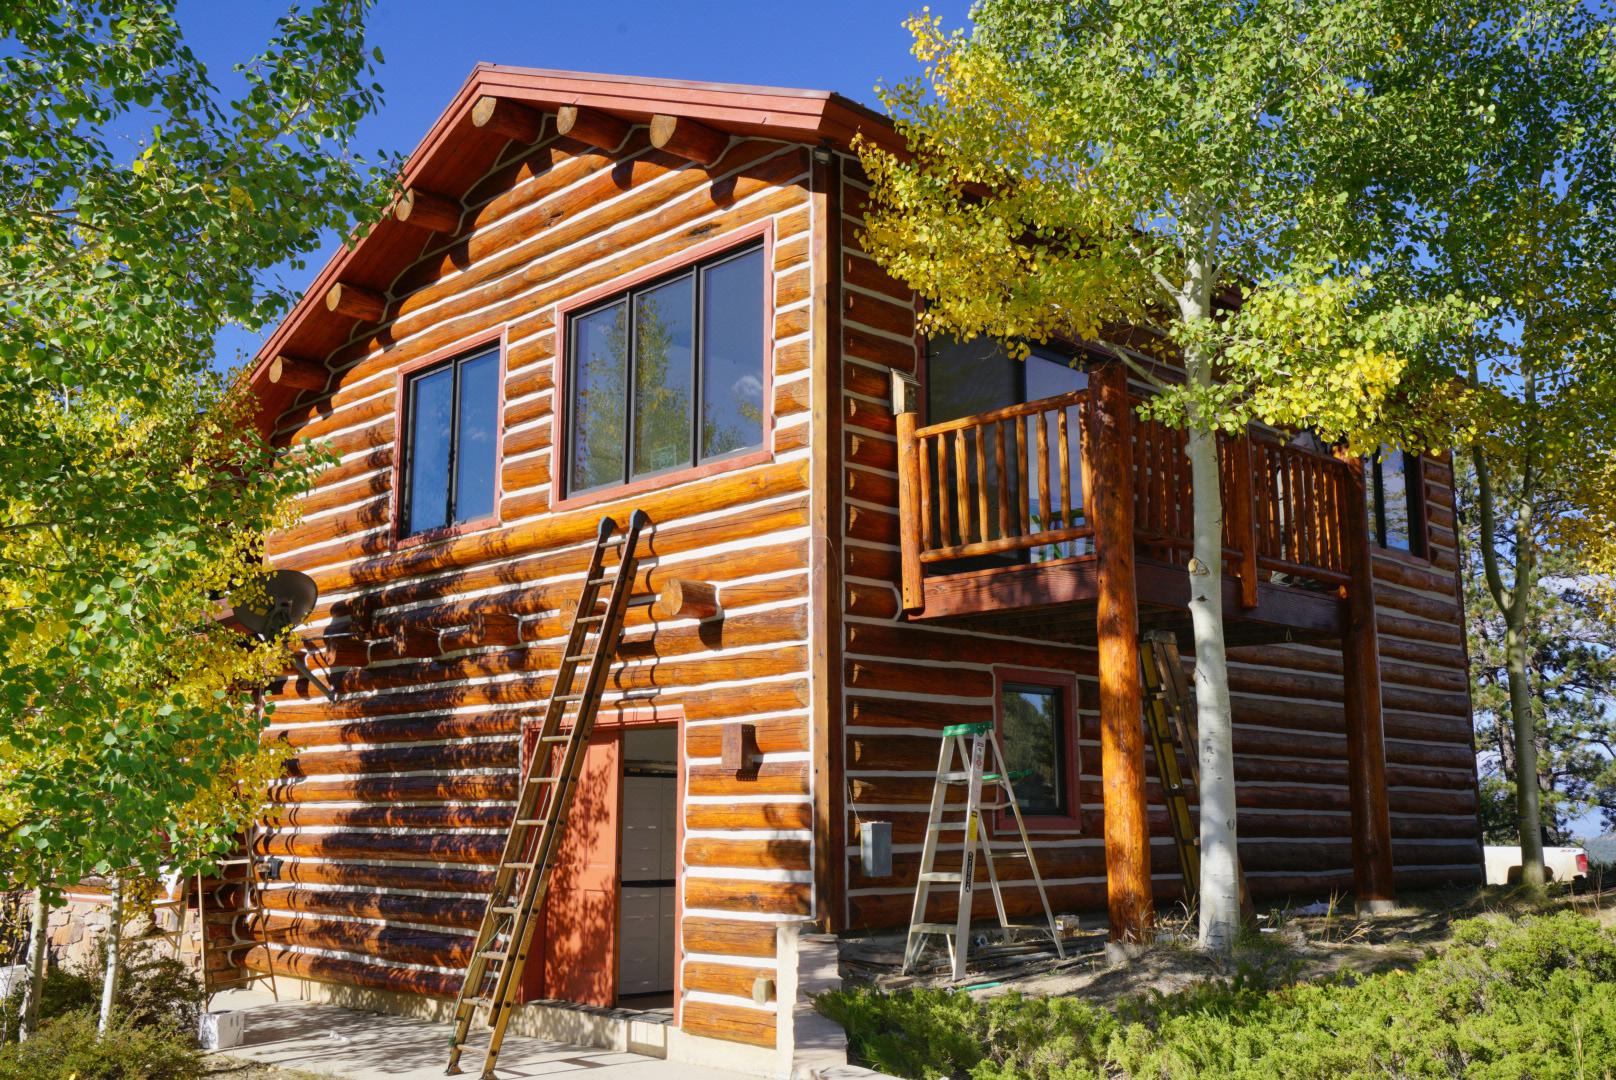 at s cloud in camp best broadmoor aimee colorado cabin cabins all heckel inclusive denver a resorts